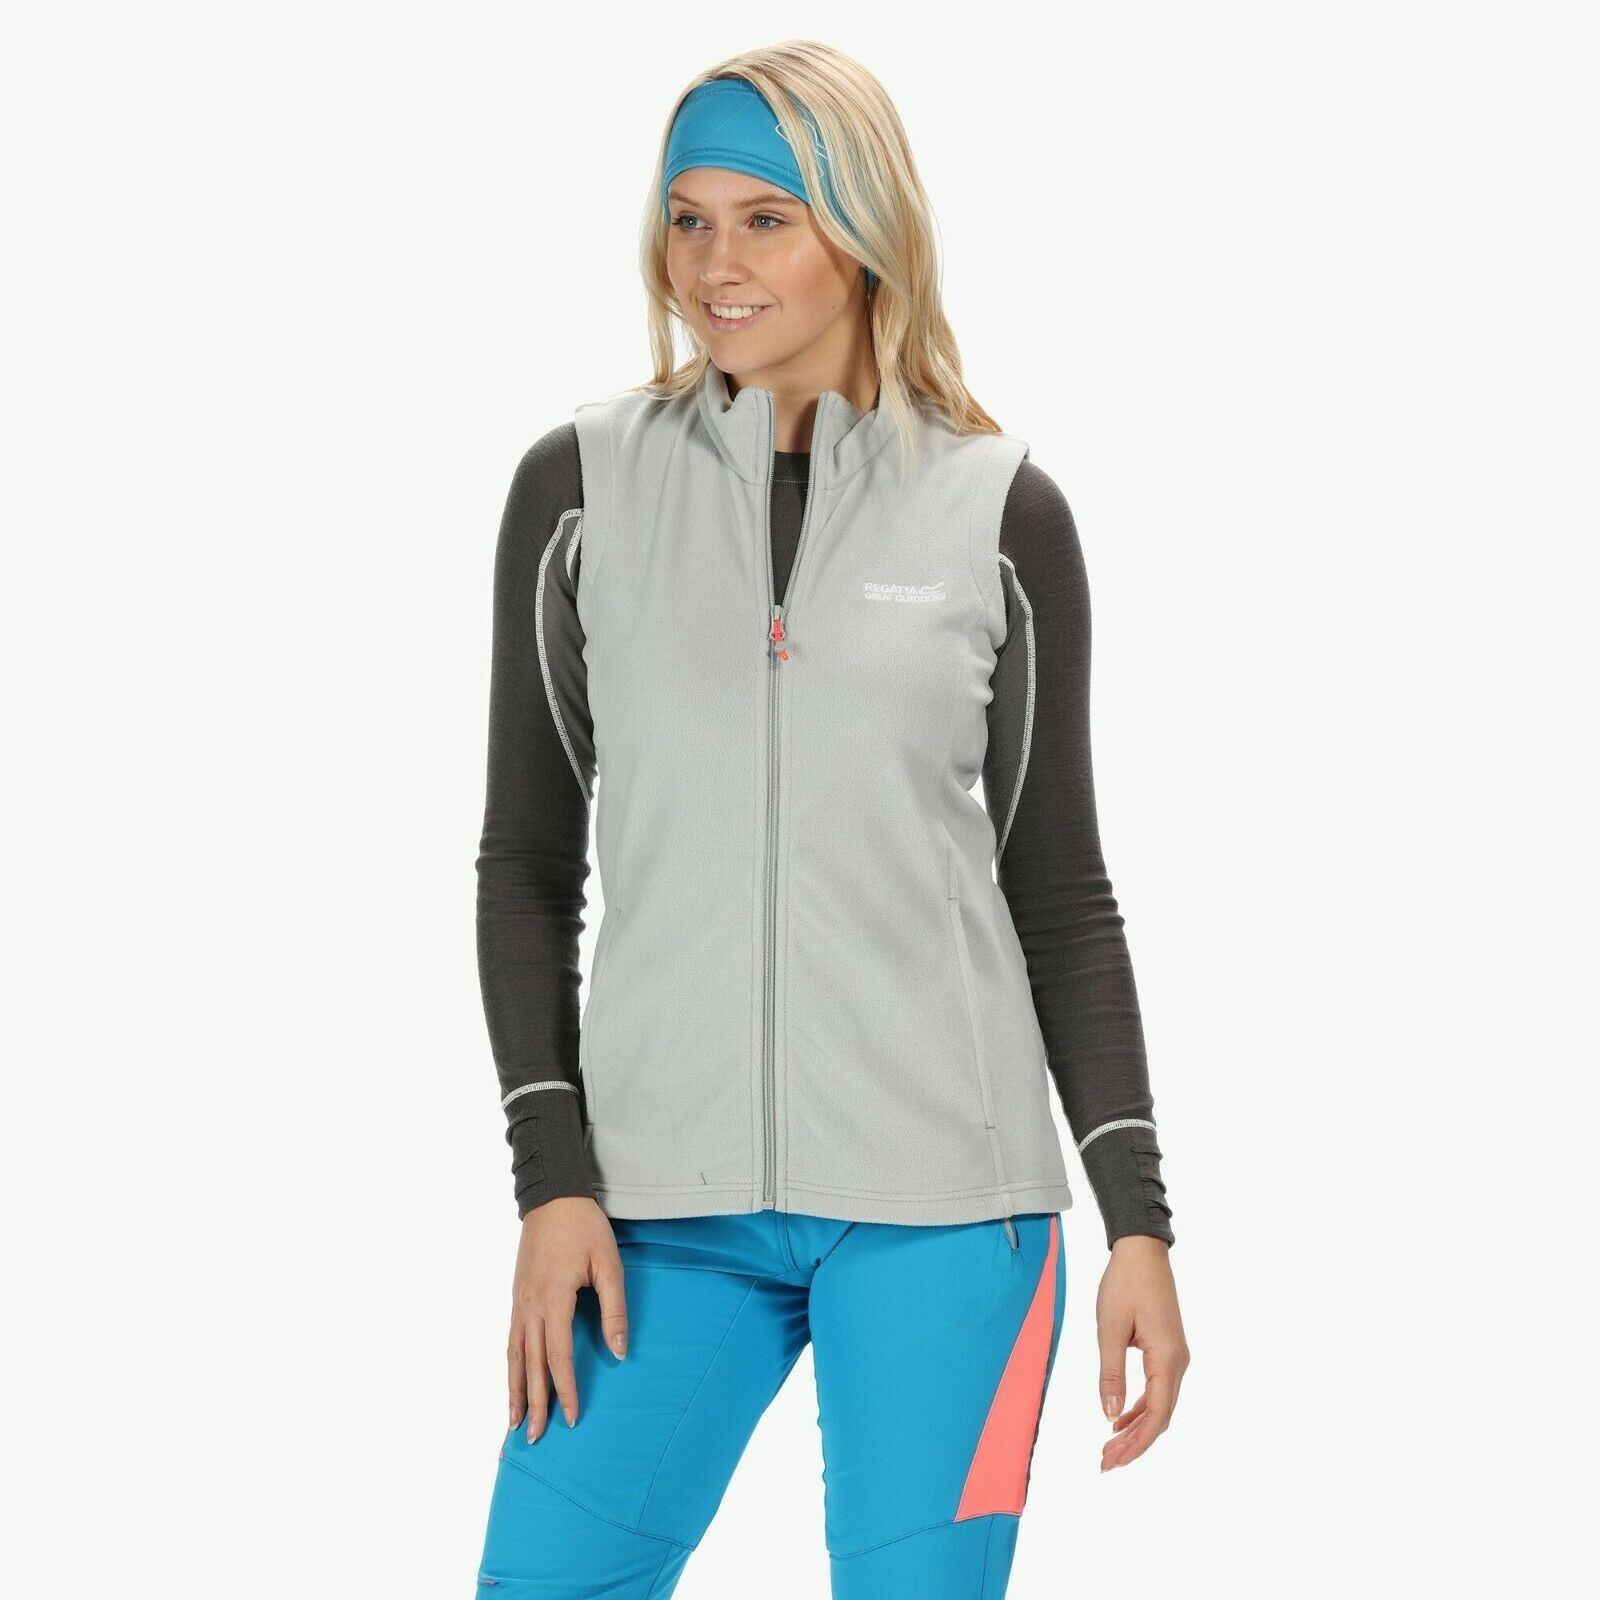 miniatuur 13 - Regatta Womens Sweetness Full Zip Micro Fleece Casual Bodywarmer Waistcoat